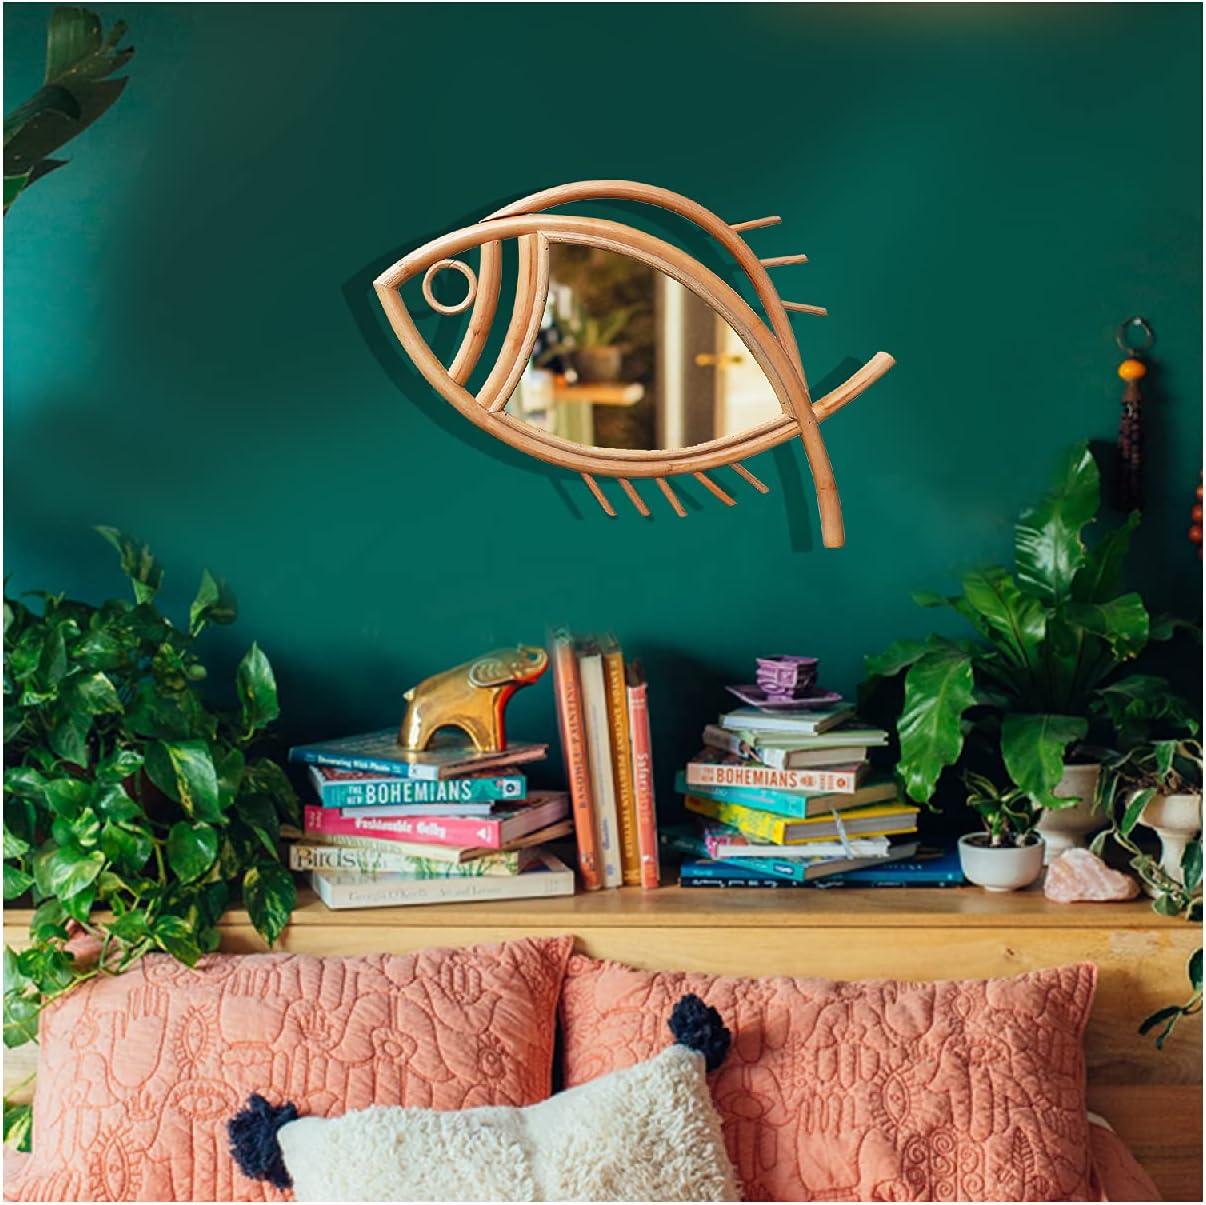 CozyHomie Boho Decor for Bedroom Living Room Hallway Decorative Wall Mirror Rattan Mirrors for Wall Rattan Wall Decor, Apartment Décor/Wall Art Rustic Fish Shape Rattan Mirror(Medium Fish)